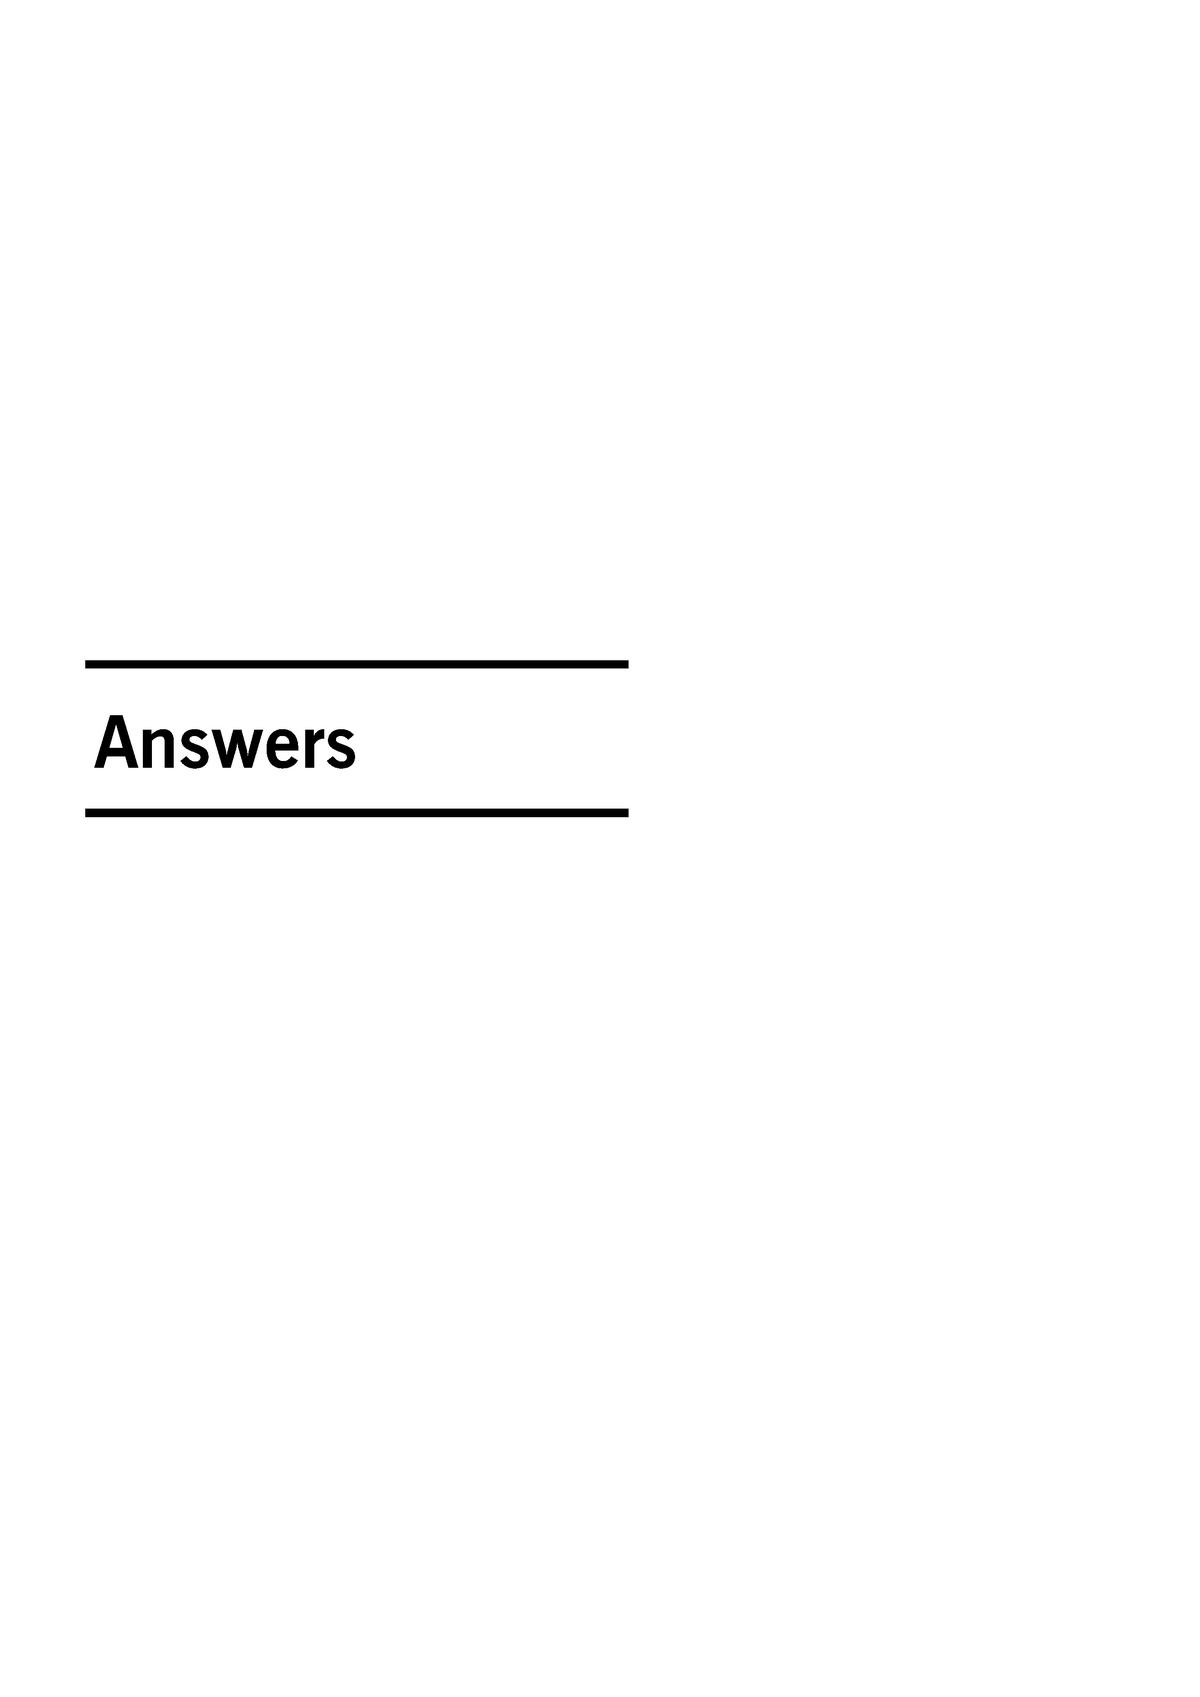 Exam 2018 - P3: Acca - StuDocu